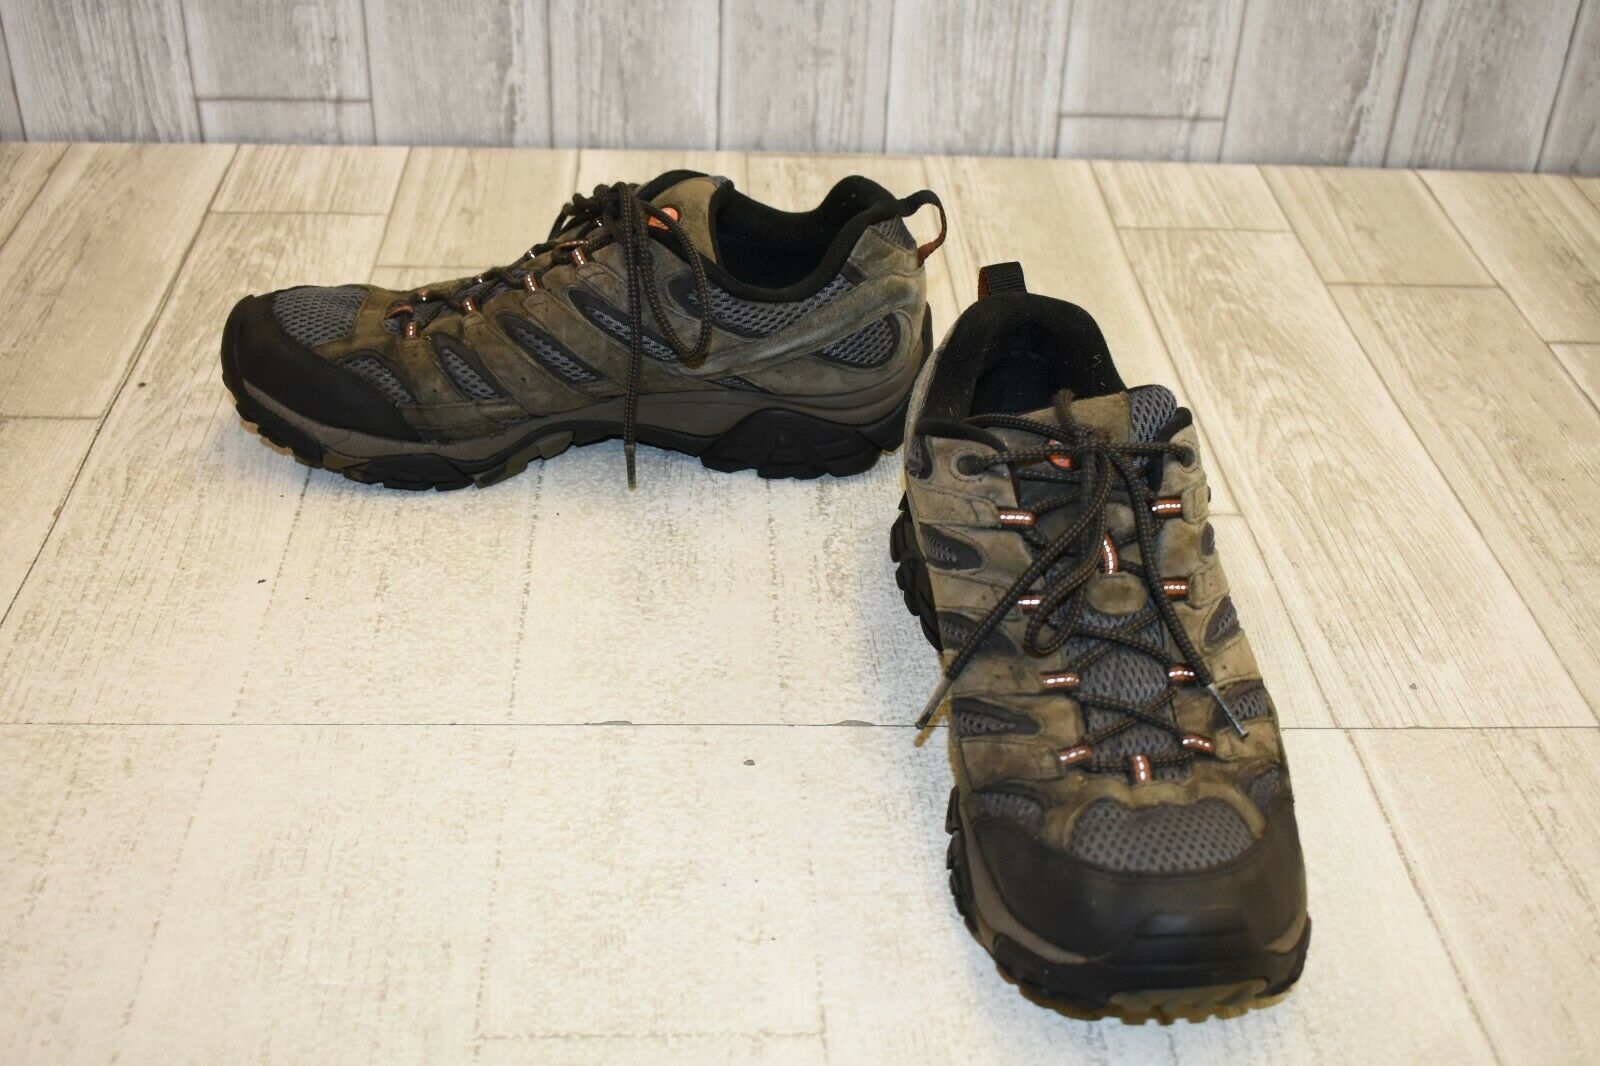 Merrell Moab 2 Waterproof Hiking shoes, Men's Size 12, Beluga